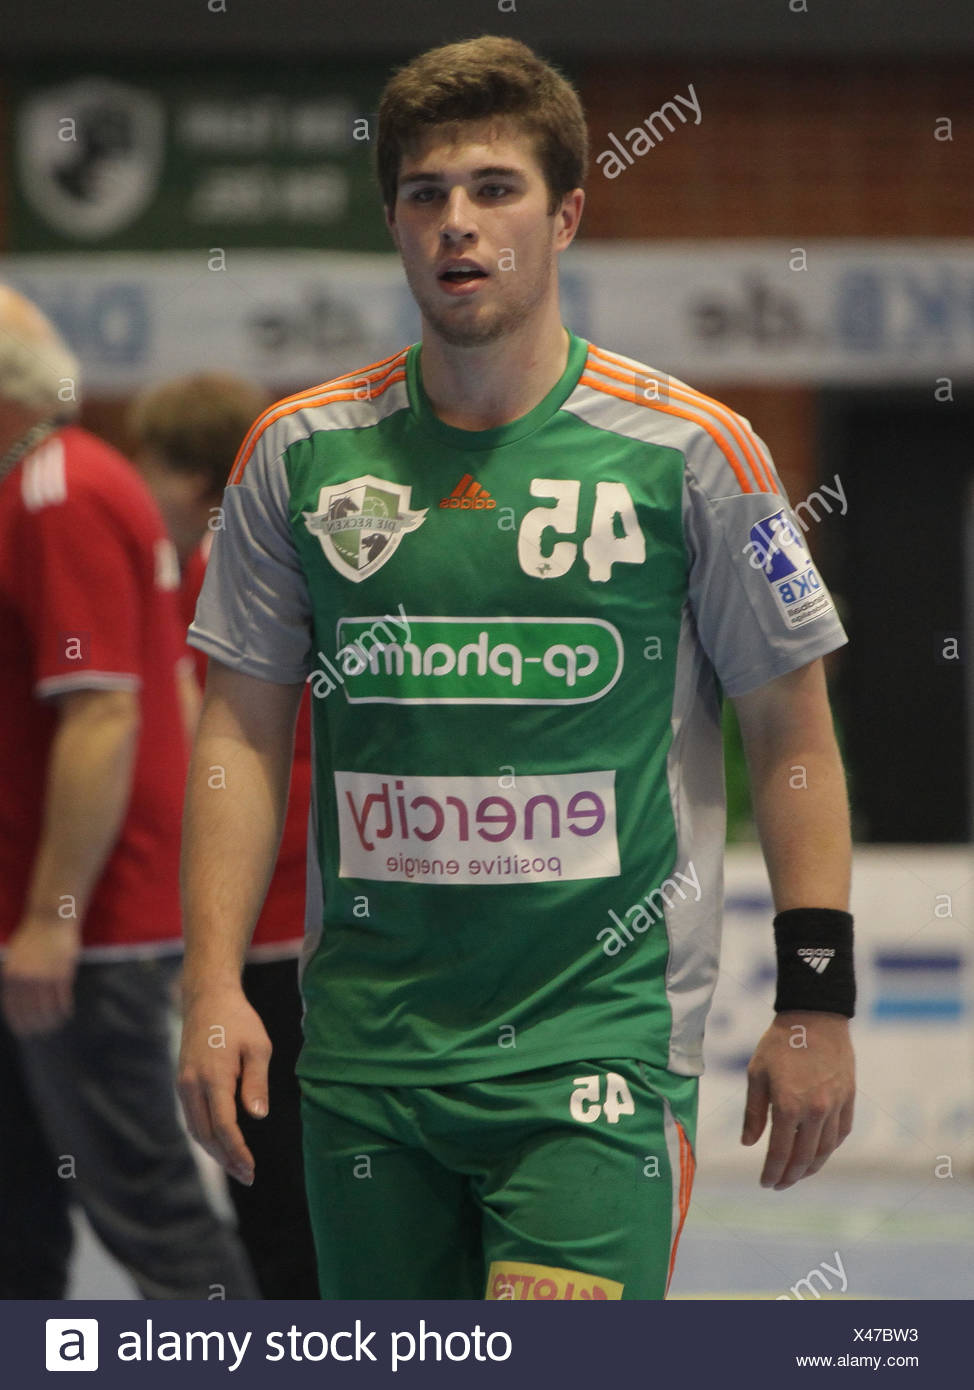 Hendrik Pollex - TSV Hannover Burgdorf - Stock Image